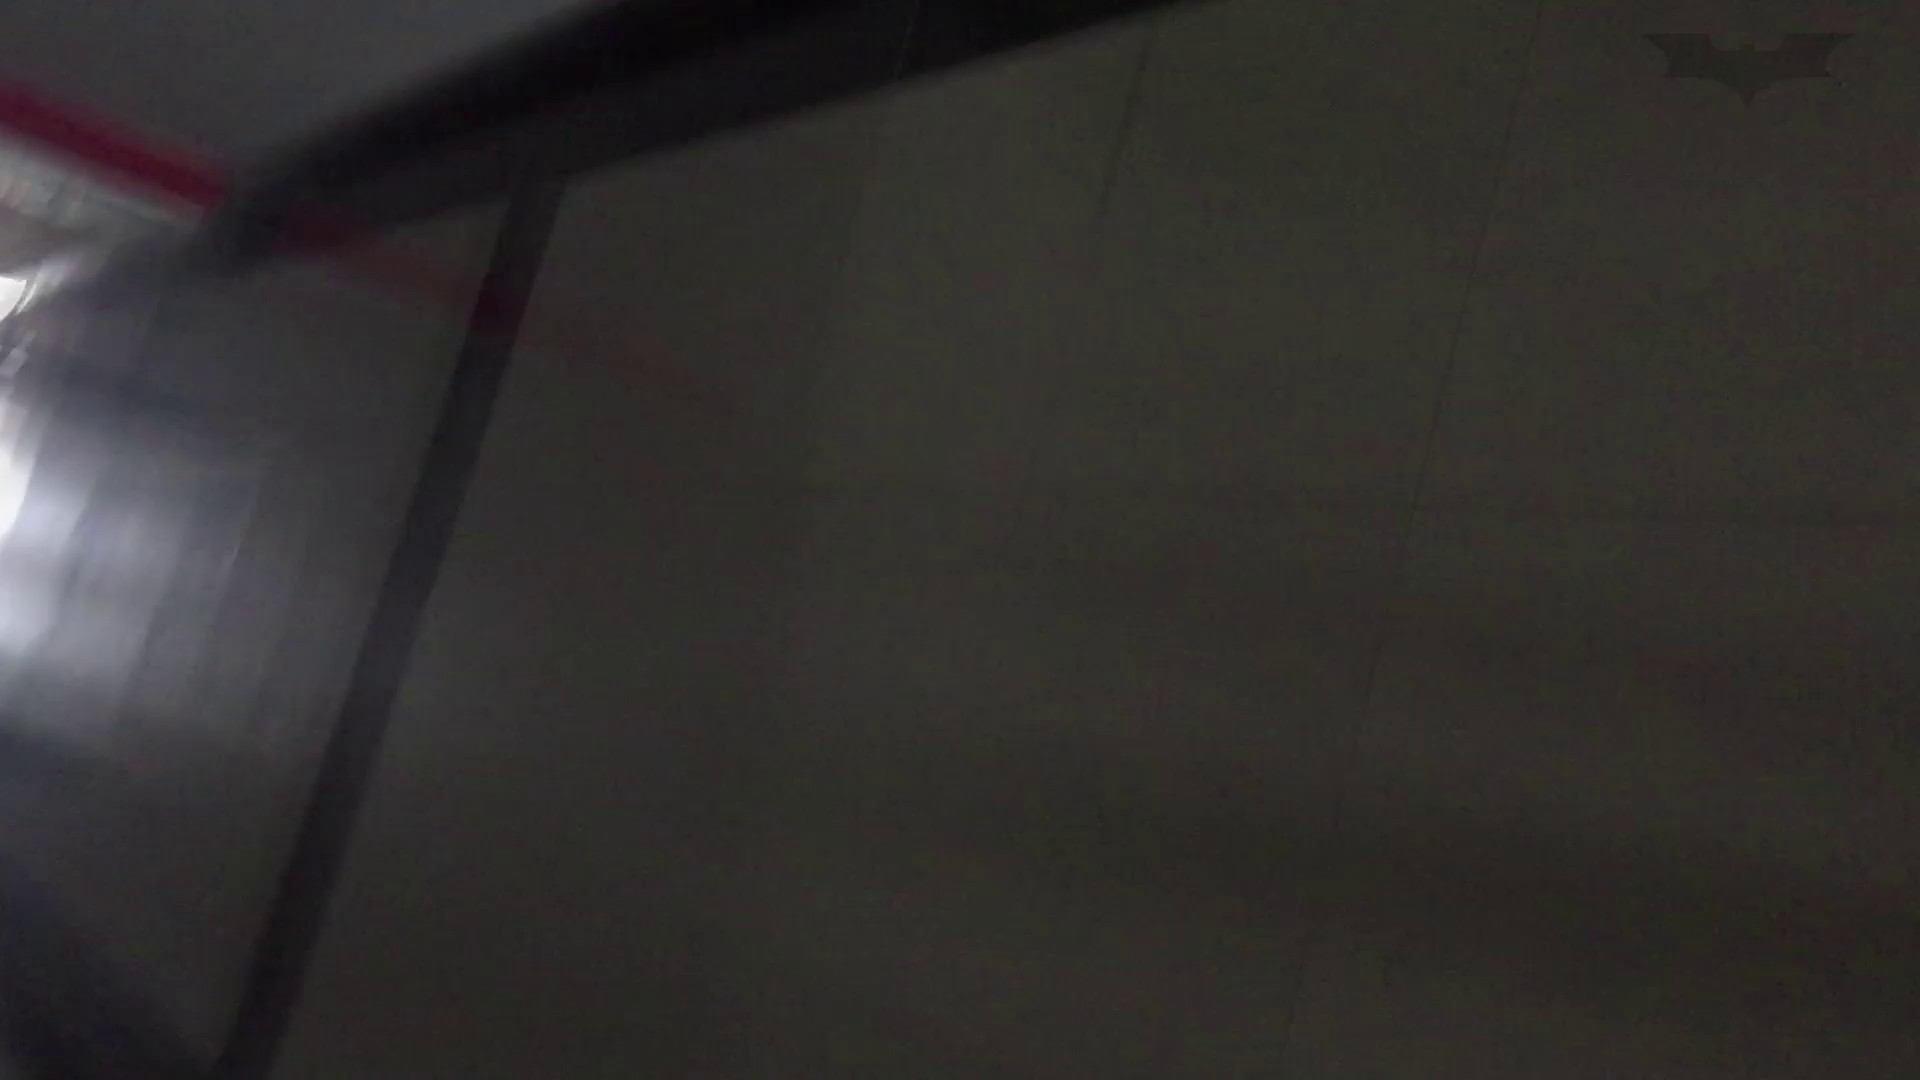 JD盗撮 美女の洗面所の秘密 Vol.74 美肌 オマンコ動画キャプチャ 109画像 35